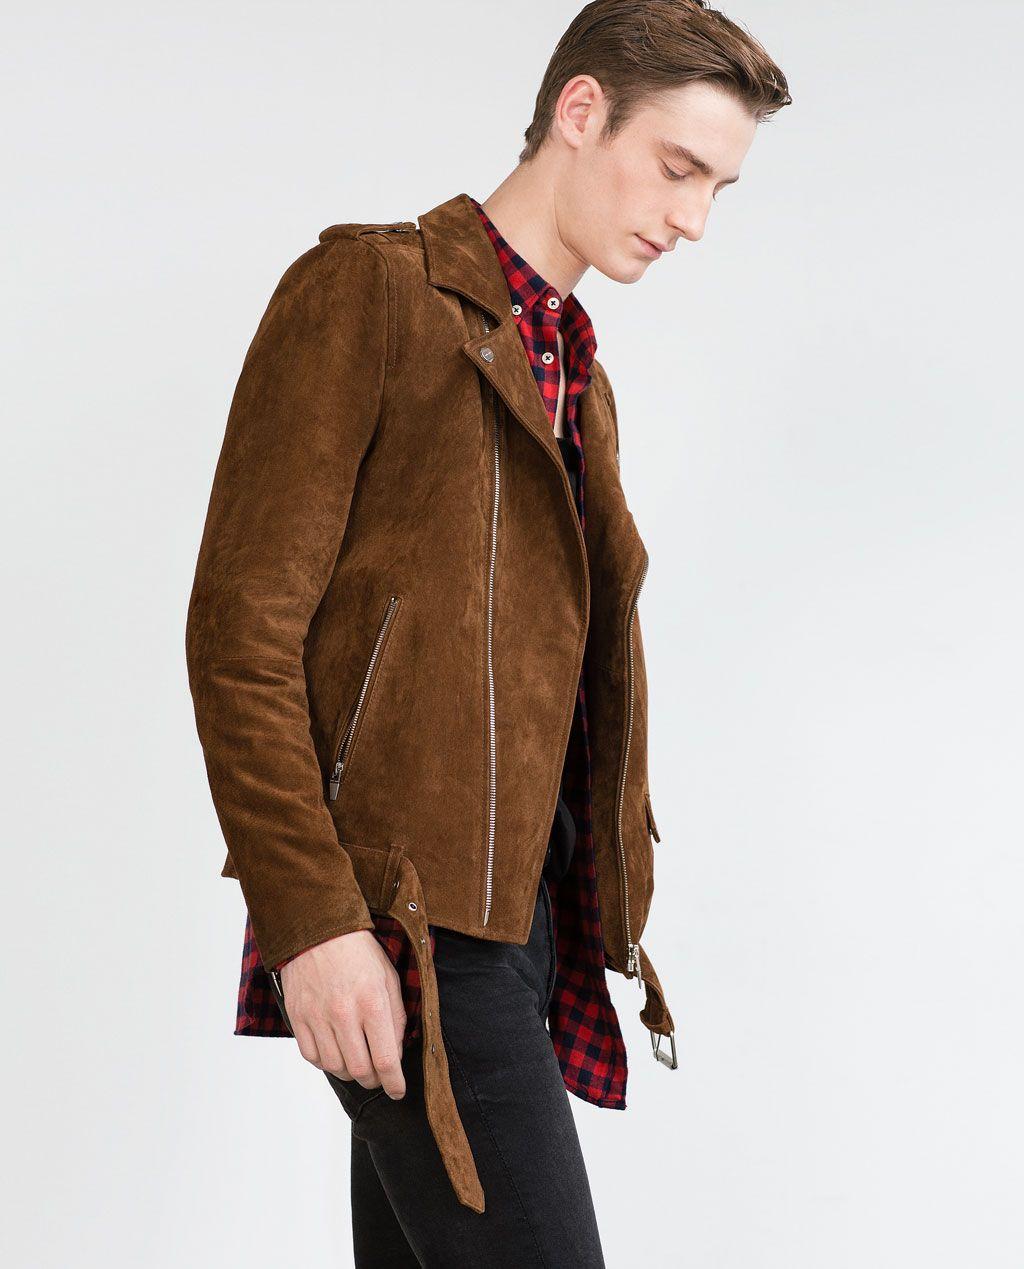 fc65cdb7af48 biker jacket from Zara